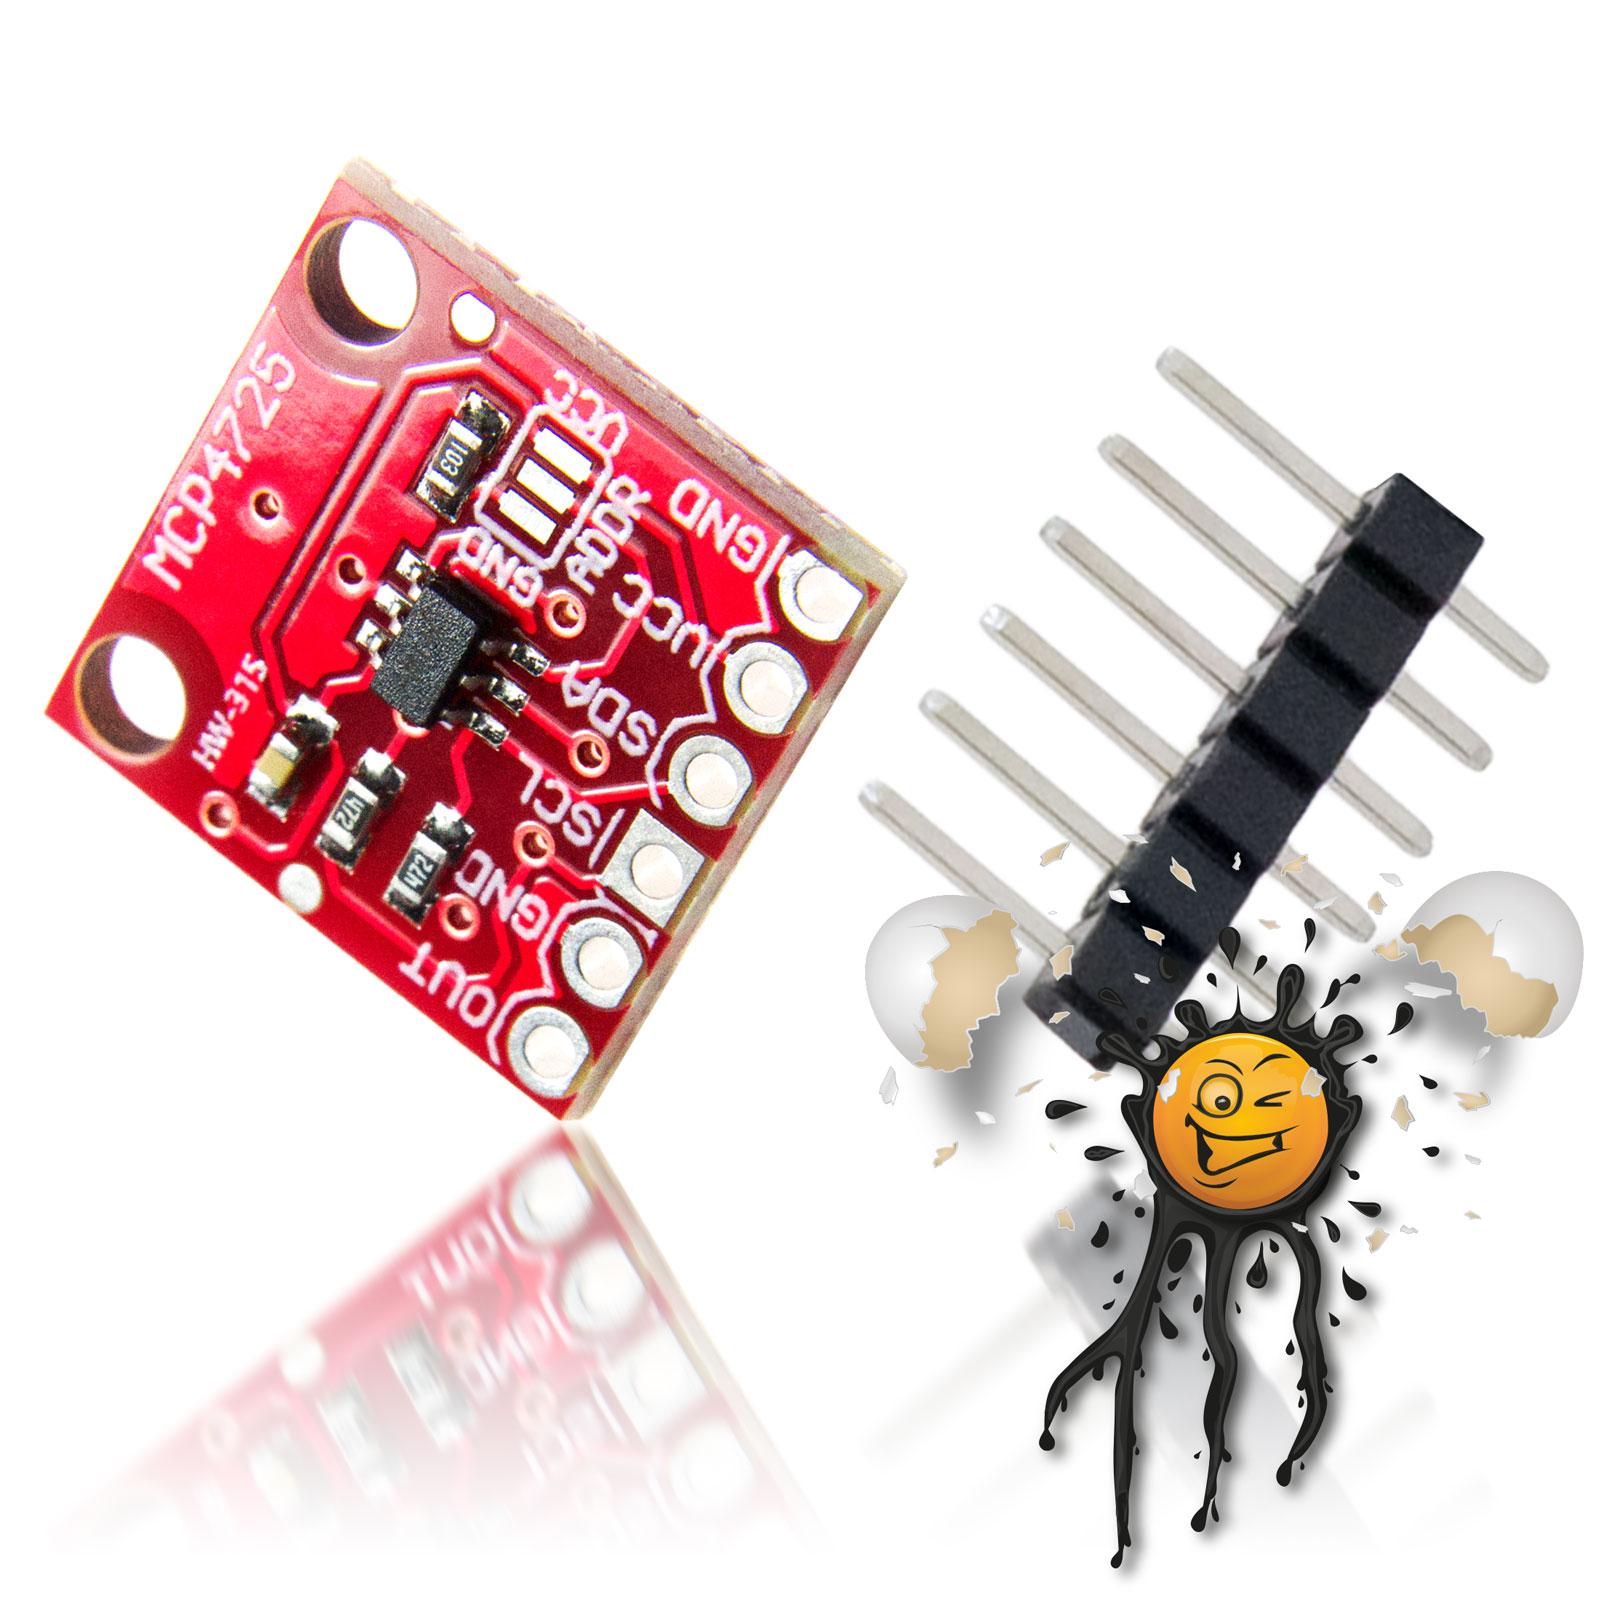 MC4725 I2C DAC Expander Board